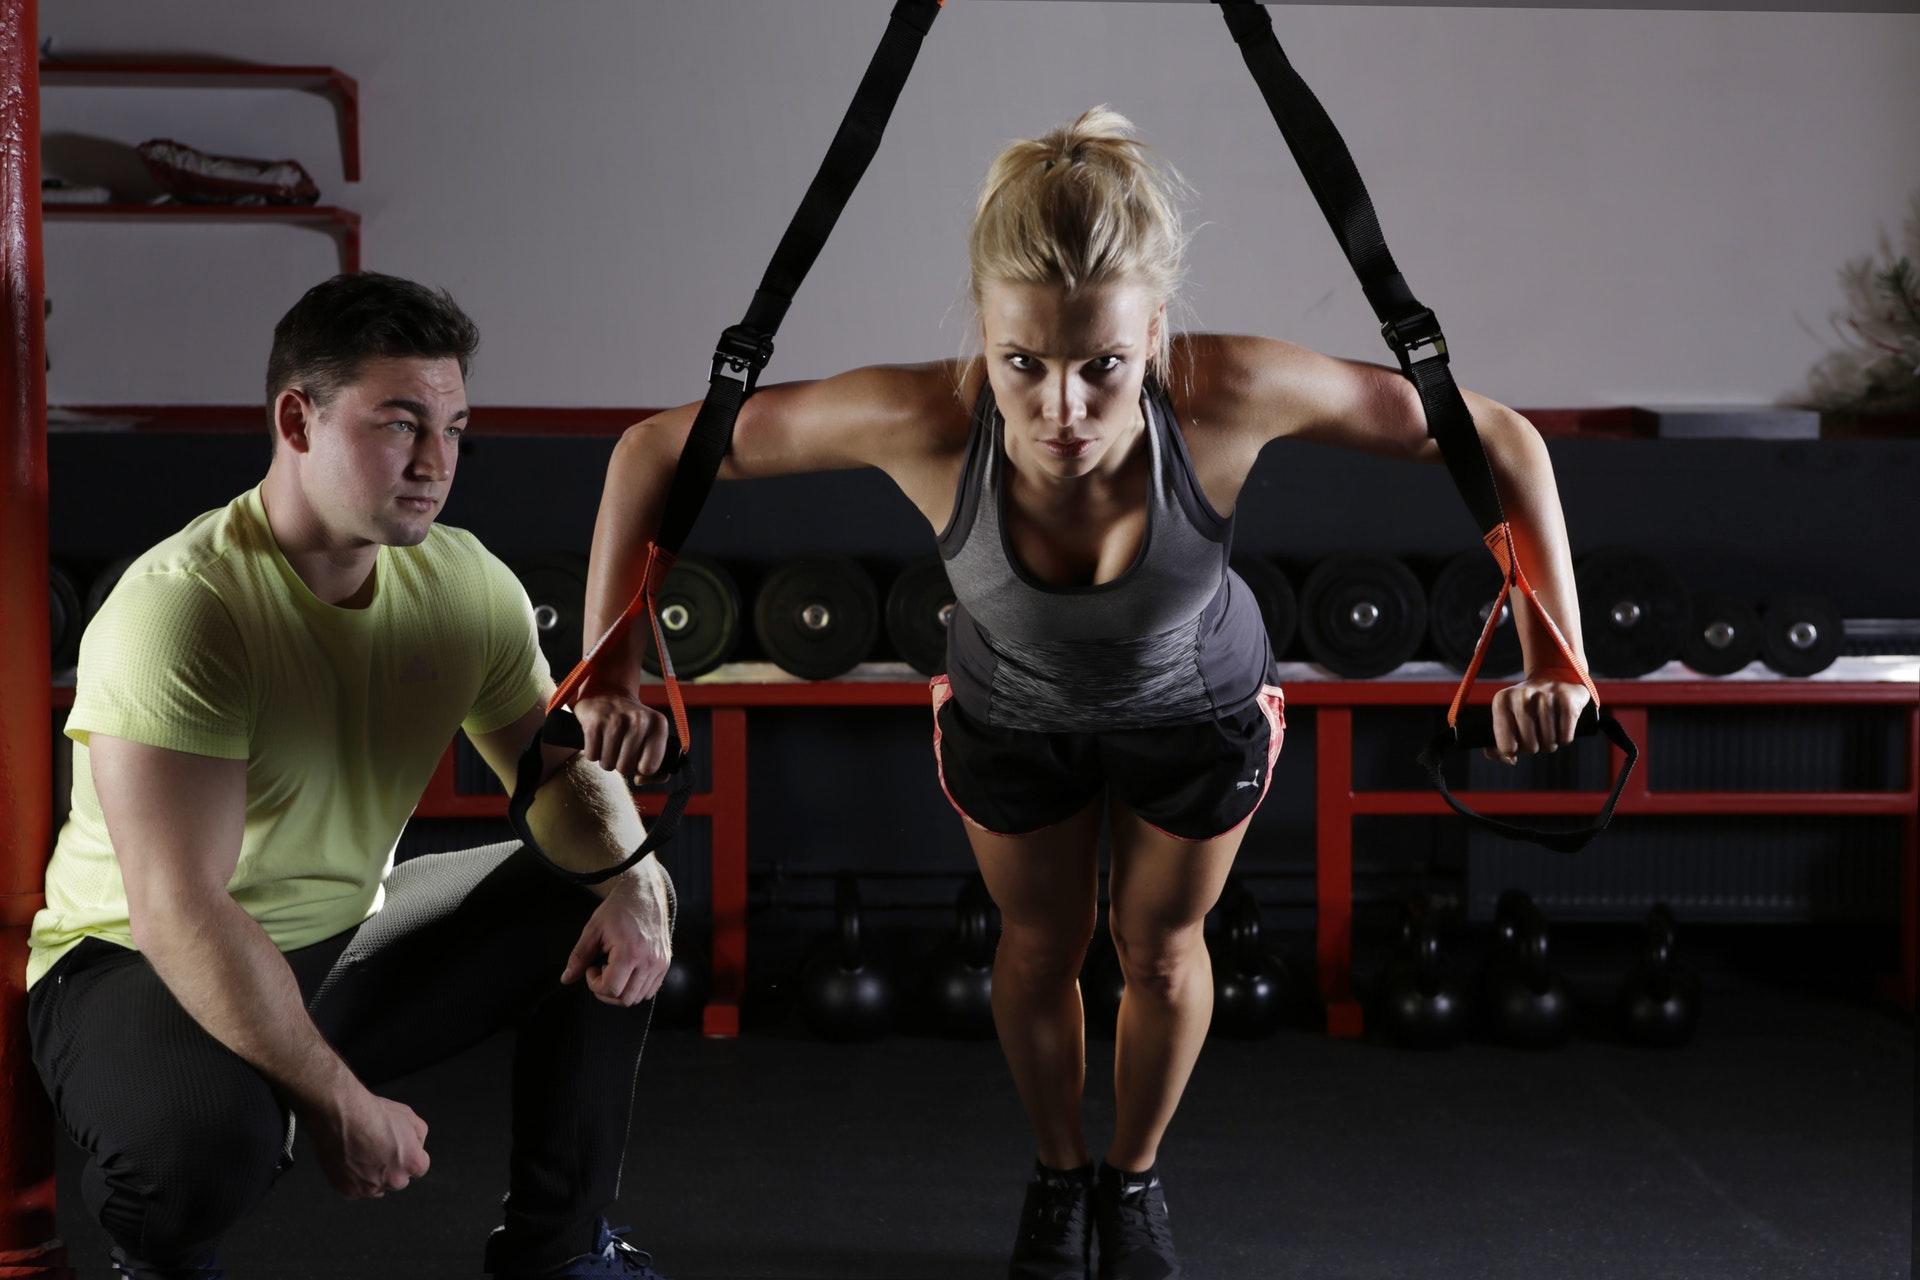 adult-athlete-body-bodybuilding-414029